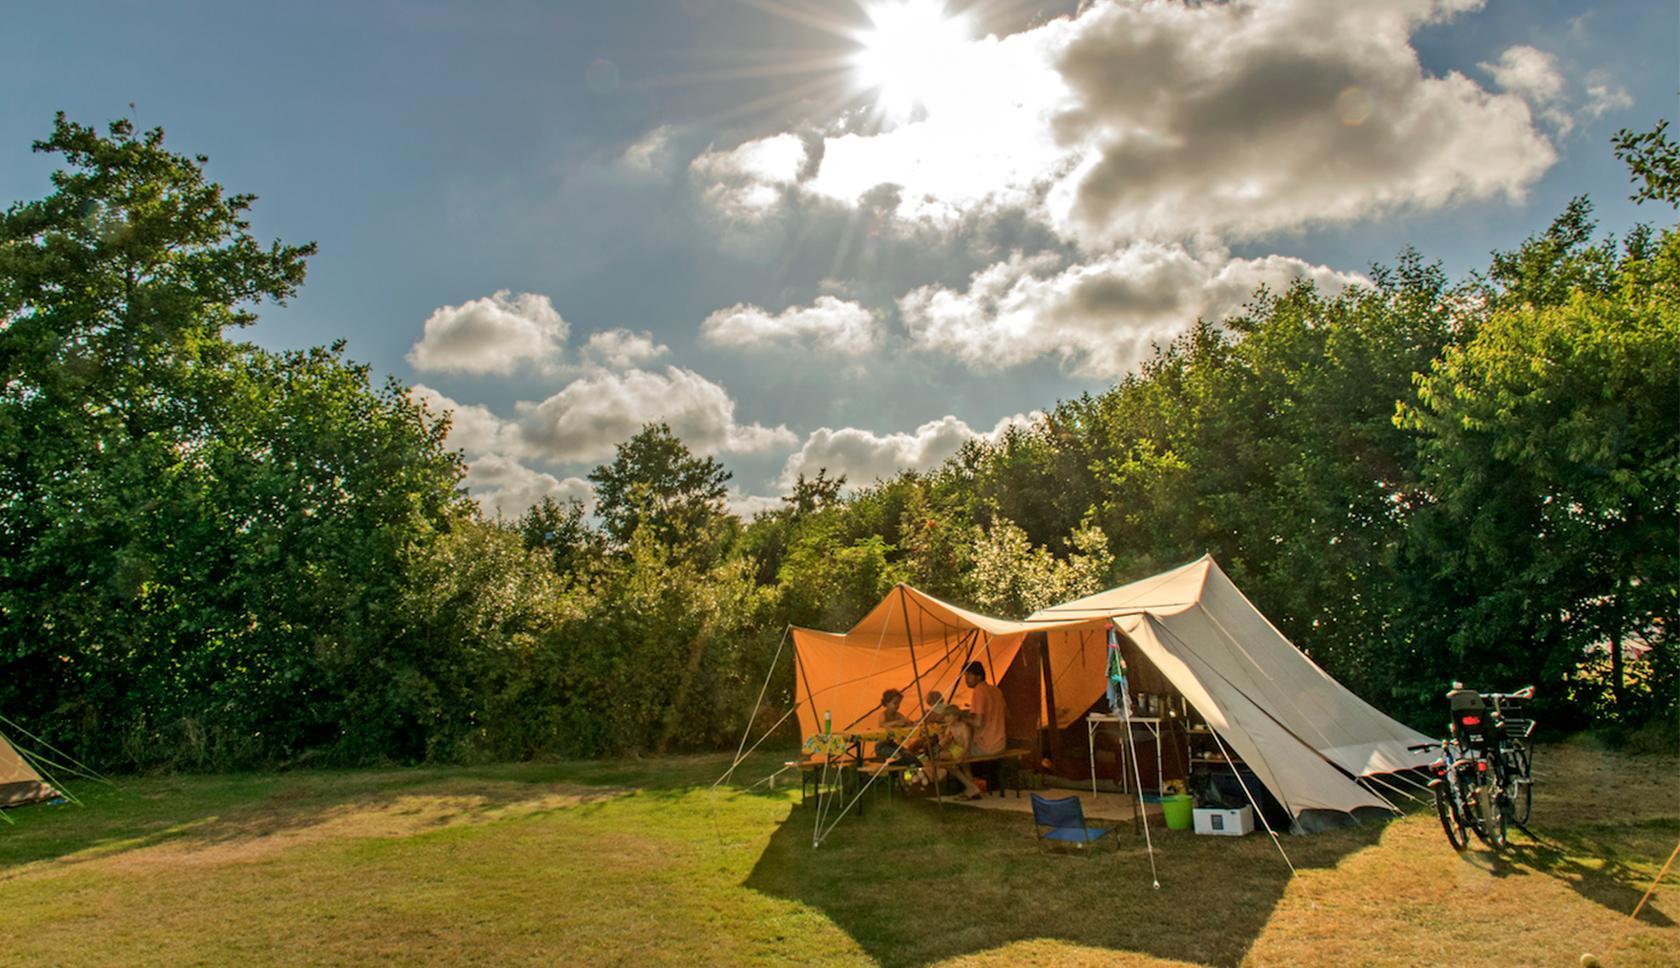 kamperen-campings-natuur-nederland-rust